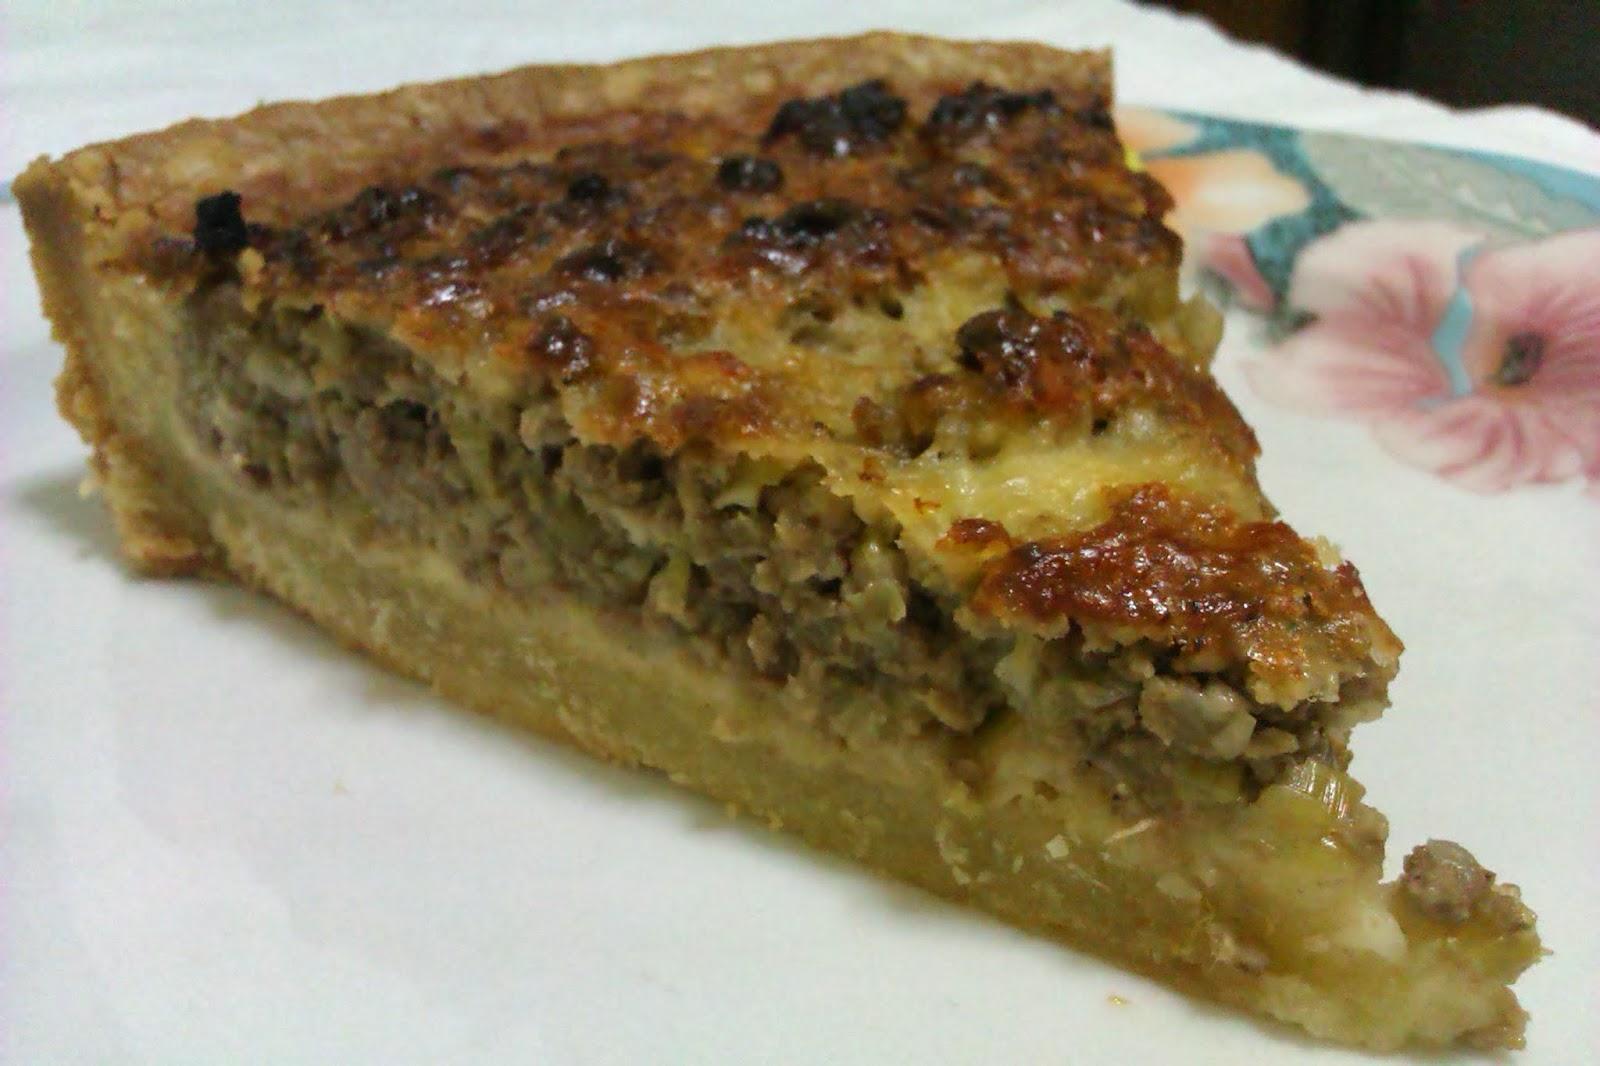 Greek Christmas Tart with meat & leeks